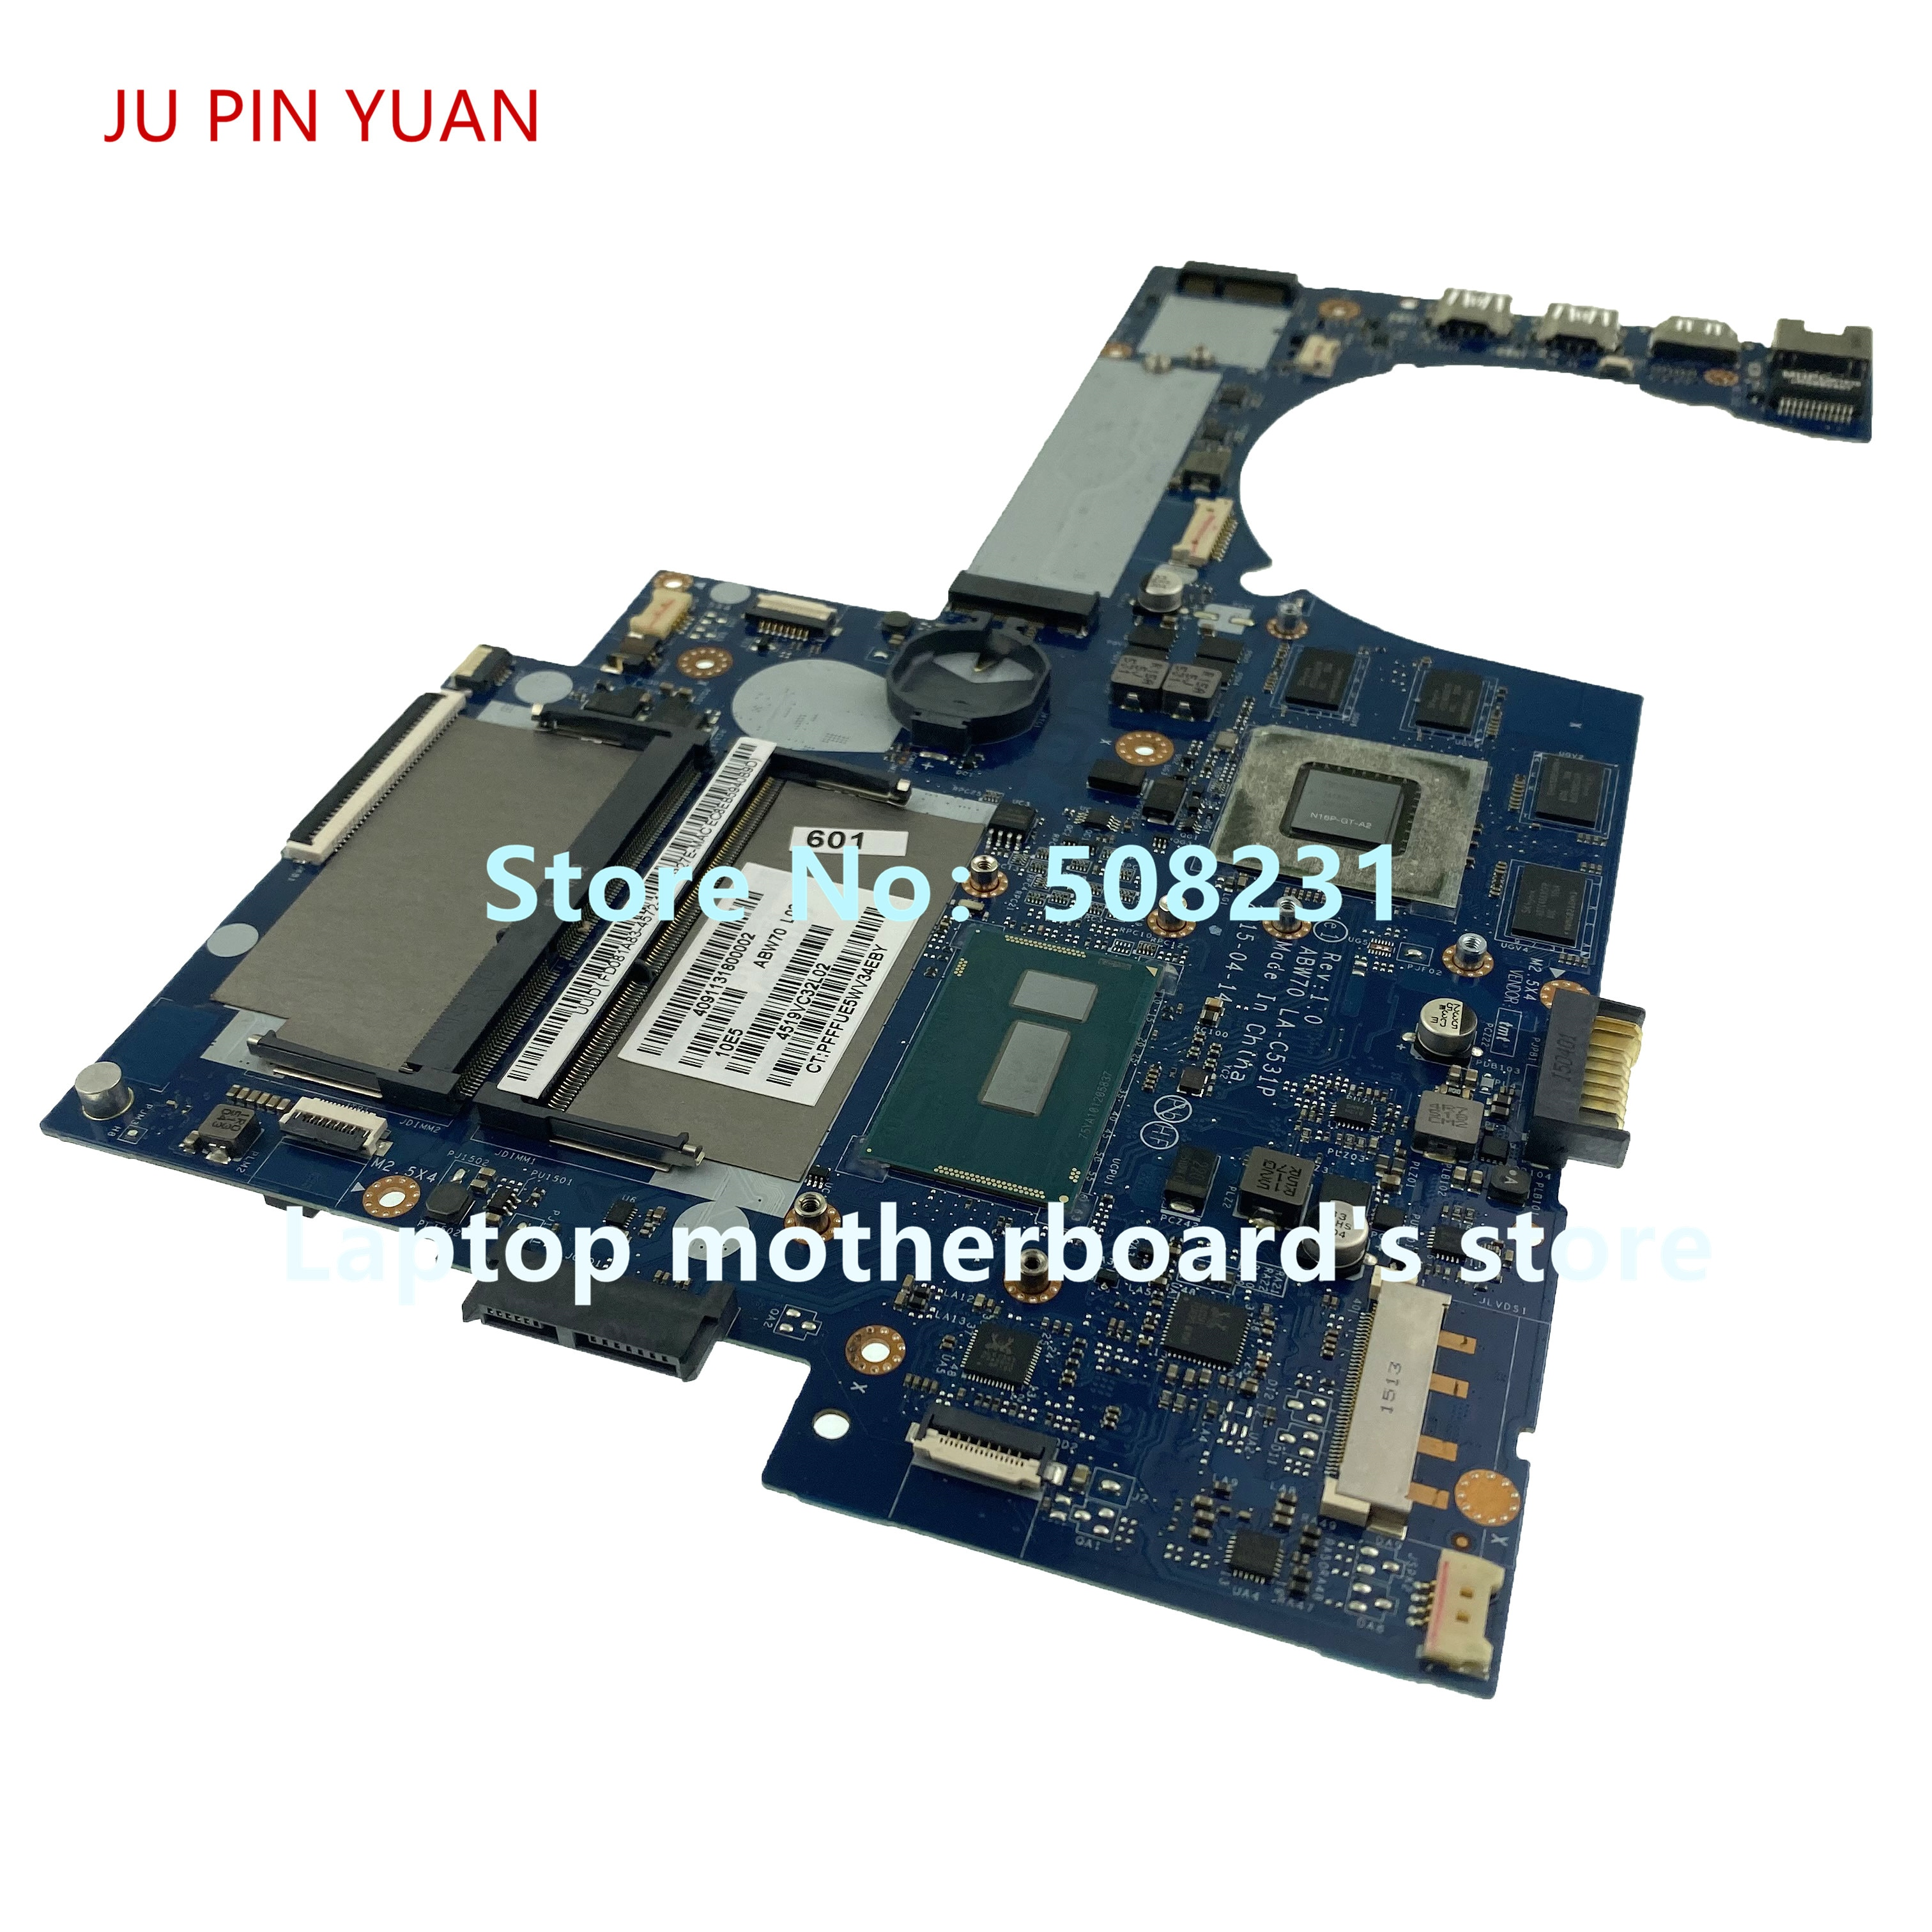 JU PIN YUAN 813682-001 813682-501 813682-601 LA-C531P لأجهزة الكمبيوتر المحمول HP 17T-N M7-N سلسلة اللوحة الأم I7-5500 وحدة المعالجة المركزية 100% تم اختبارها بالكامل